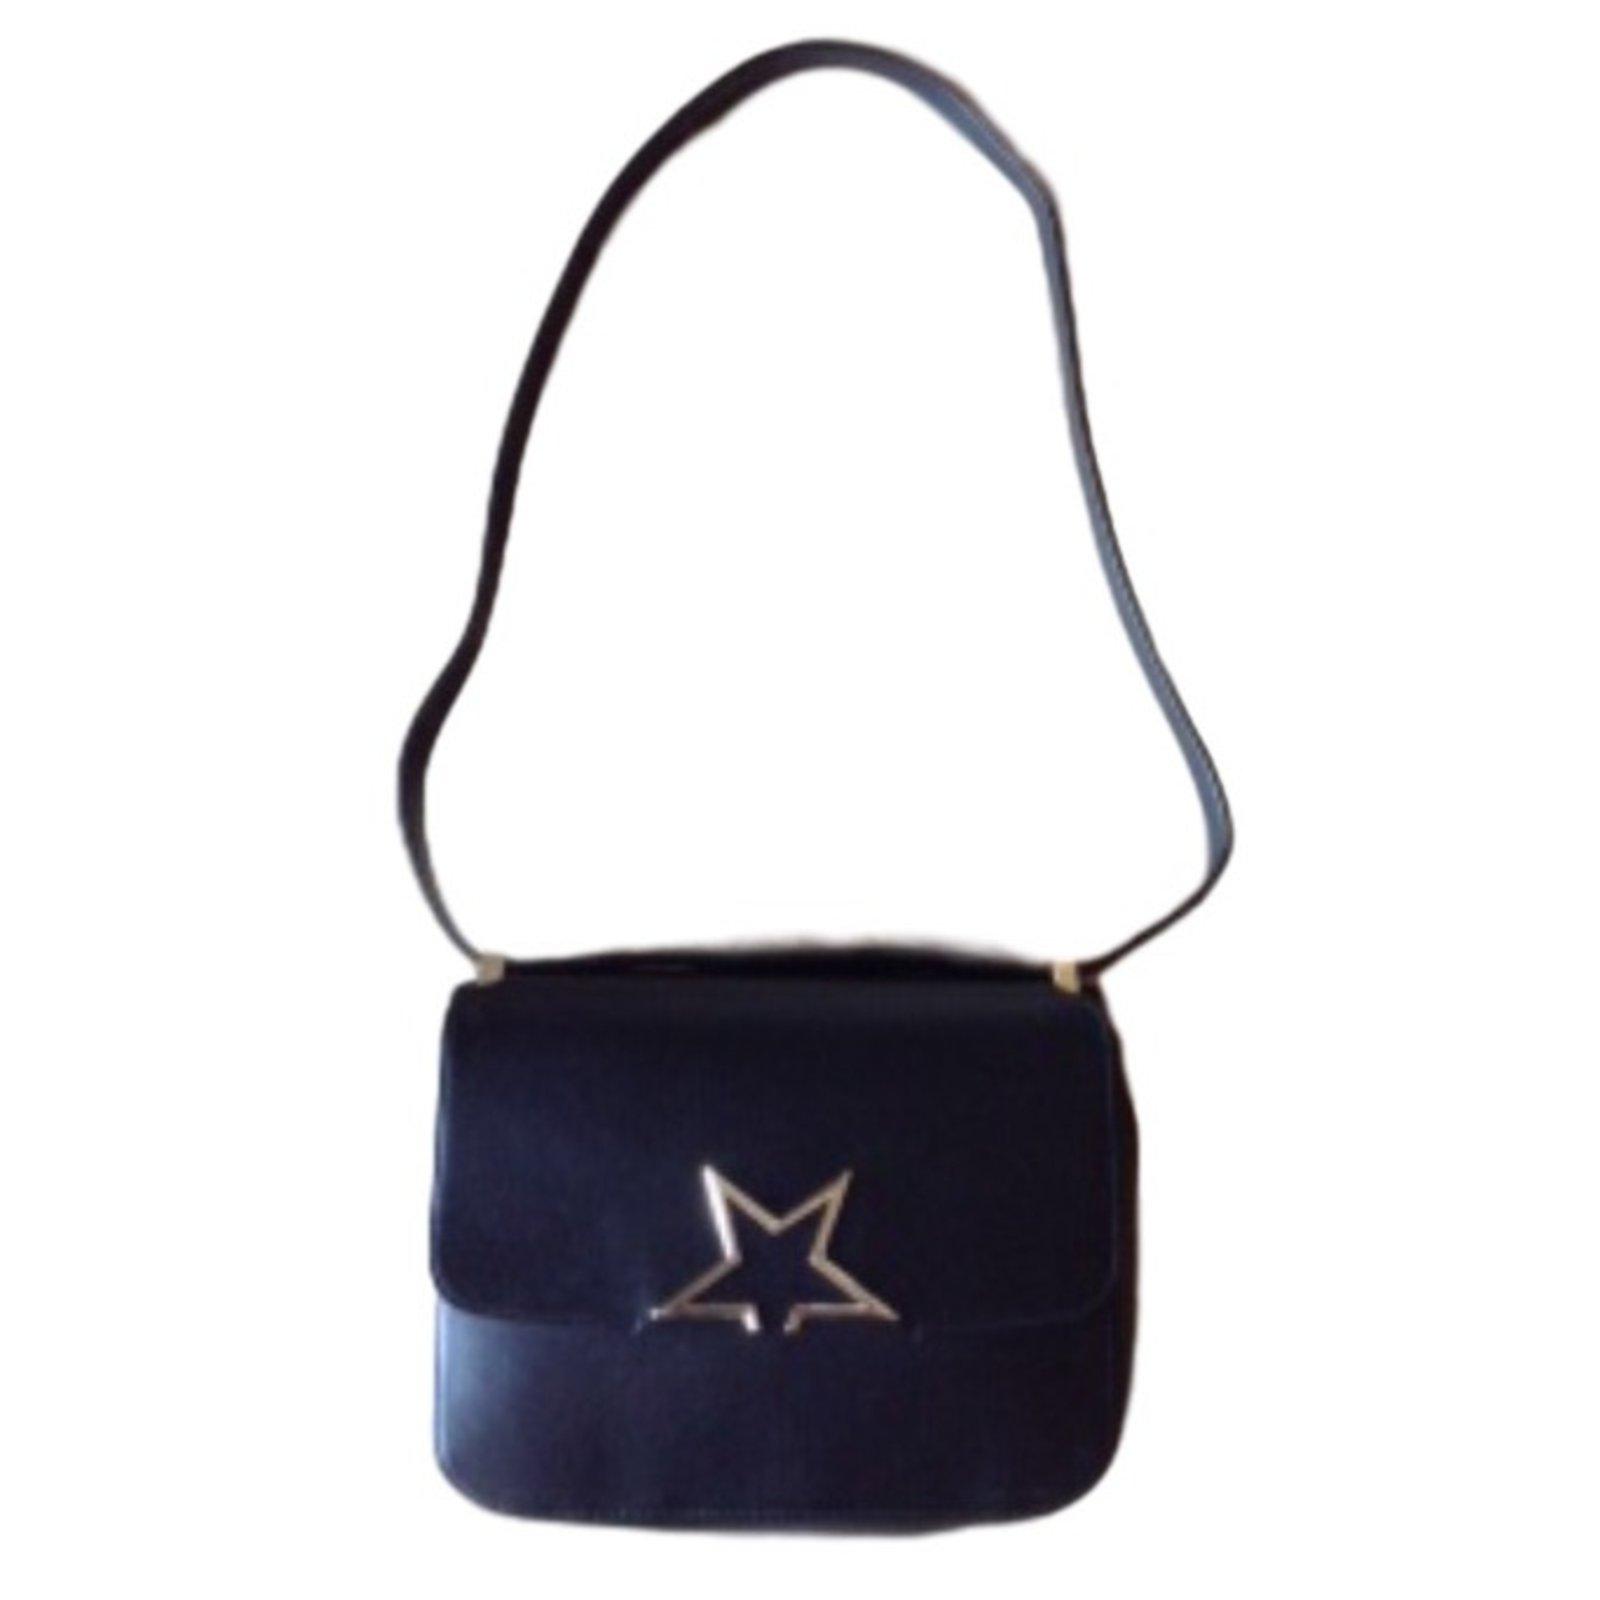 Golden Goose Handbag Handbags Leather Black Ref 27054